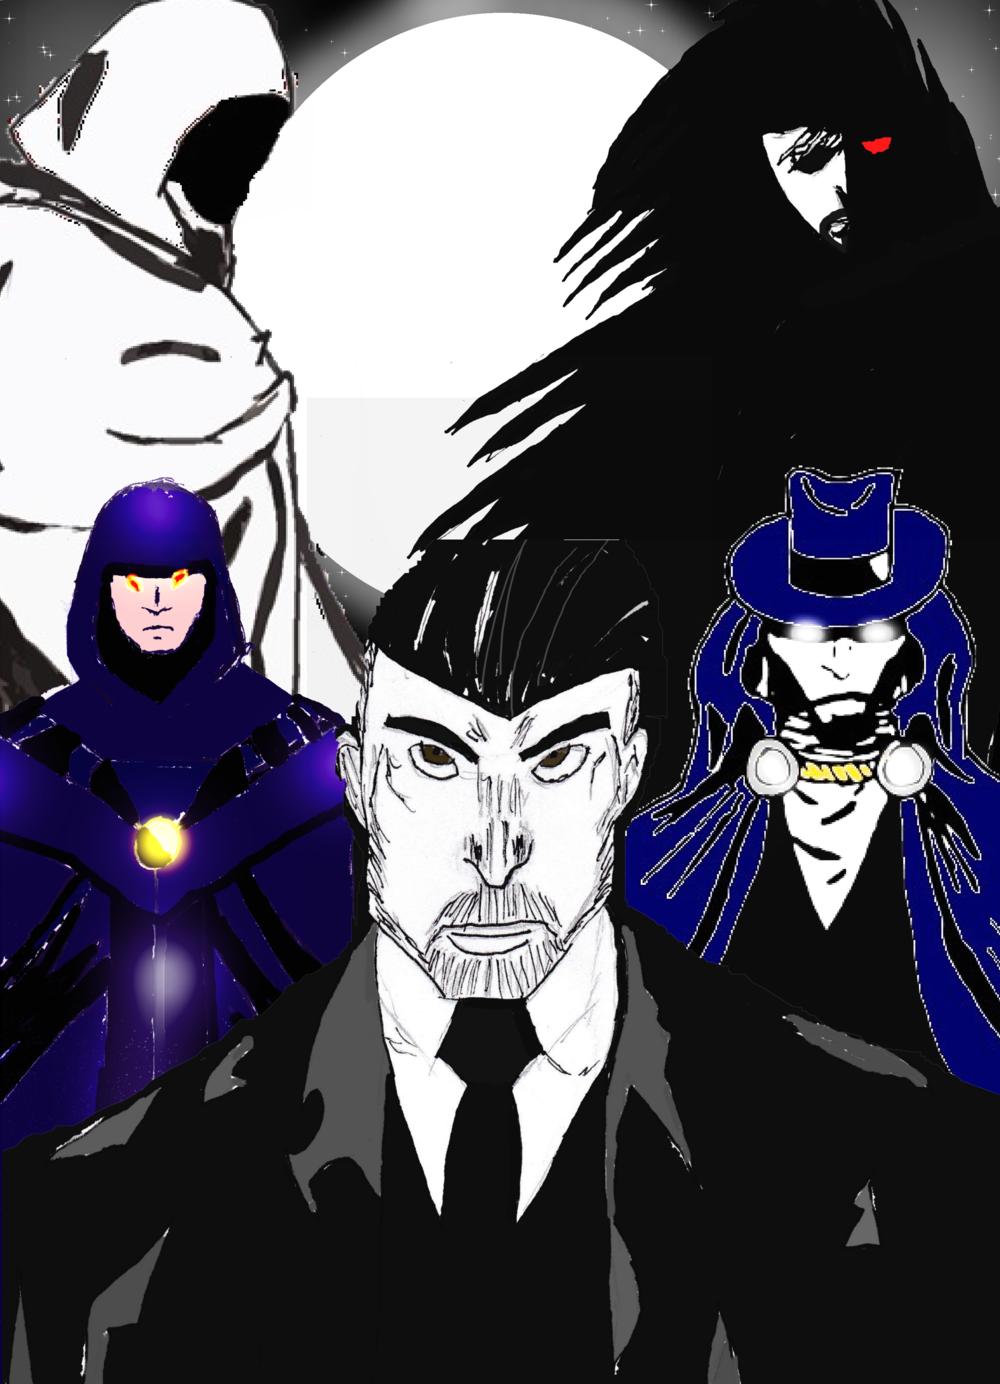 From Top Right, Center, Top Left:     Darkous of the Astrals   ,    Visitant Outlander   ,    Travis Vail   ,    Dark Manhunter   ,    Specter Errant